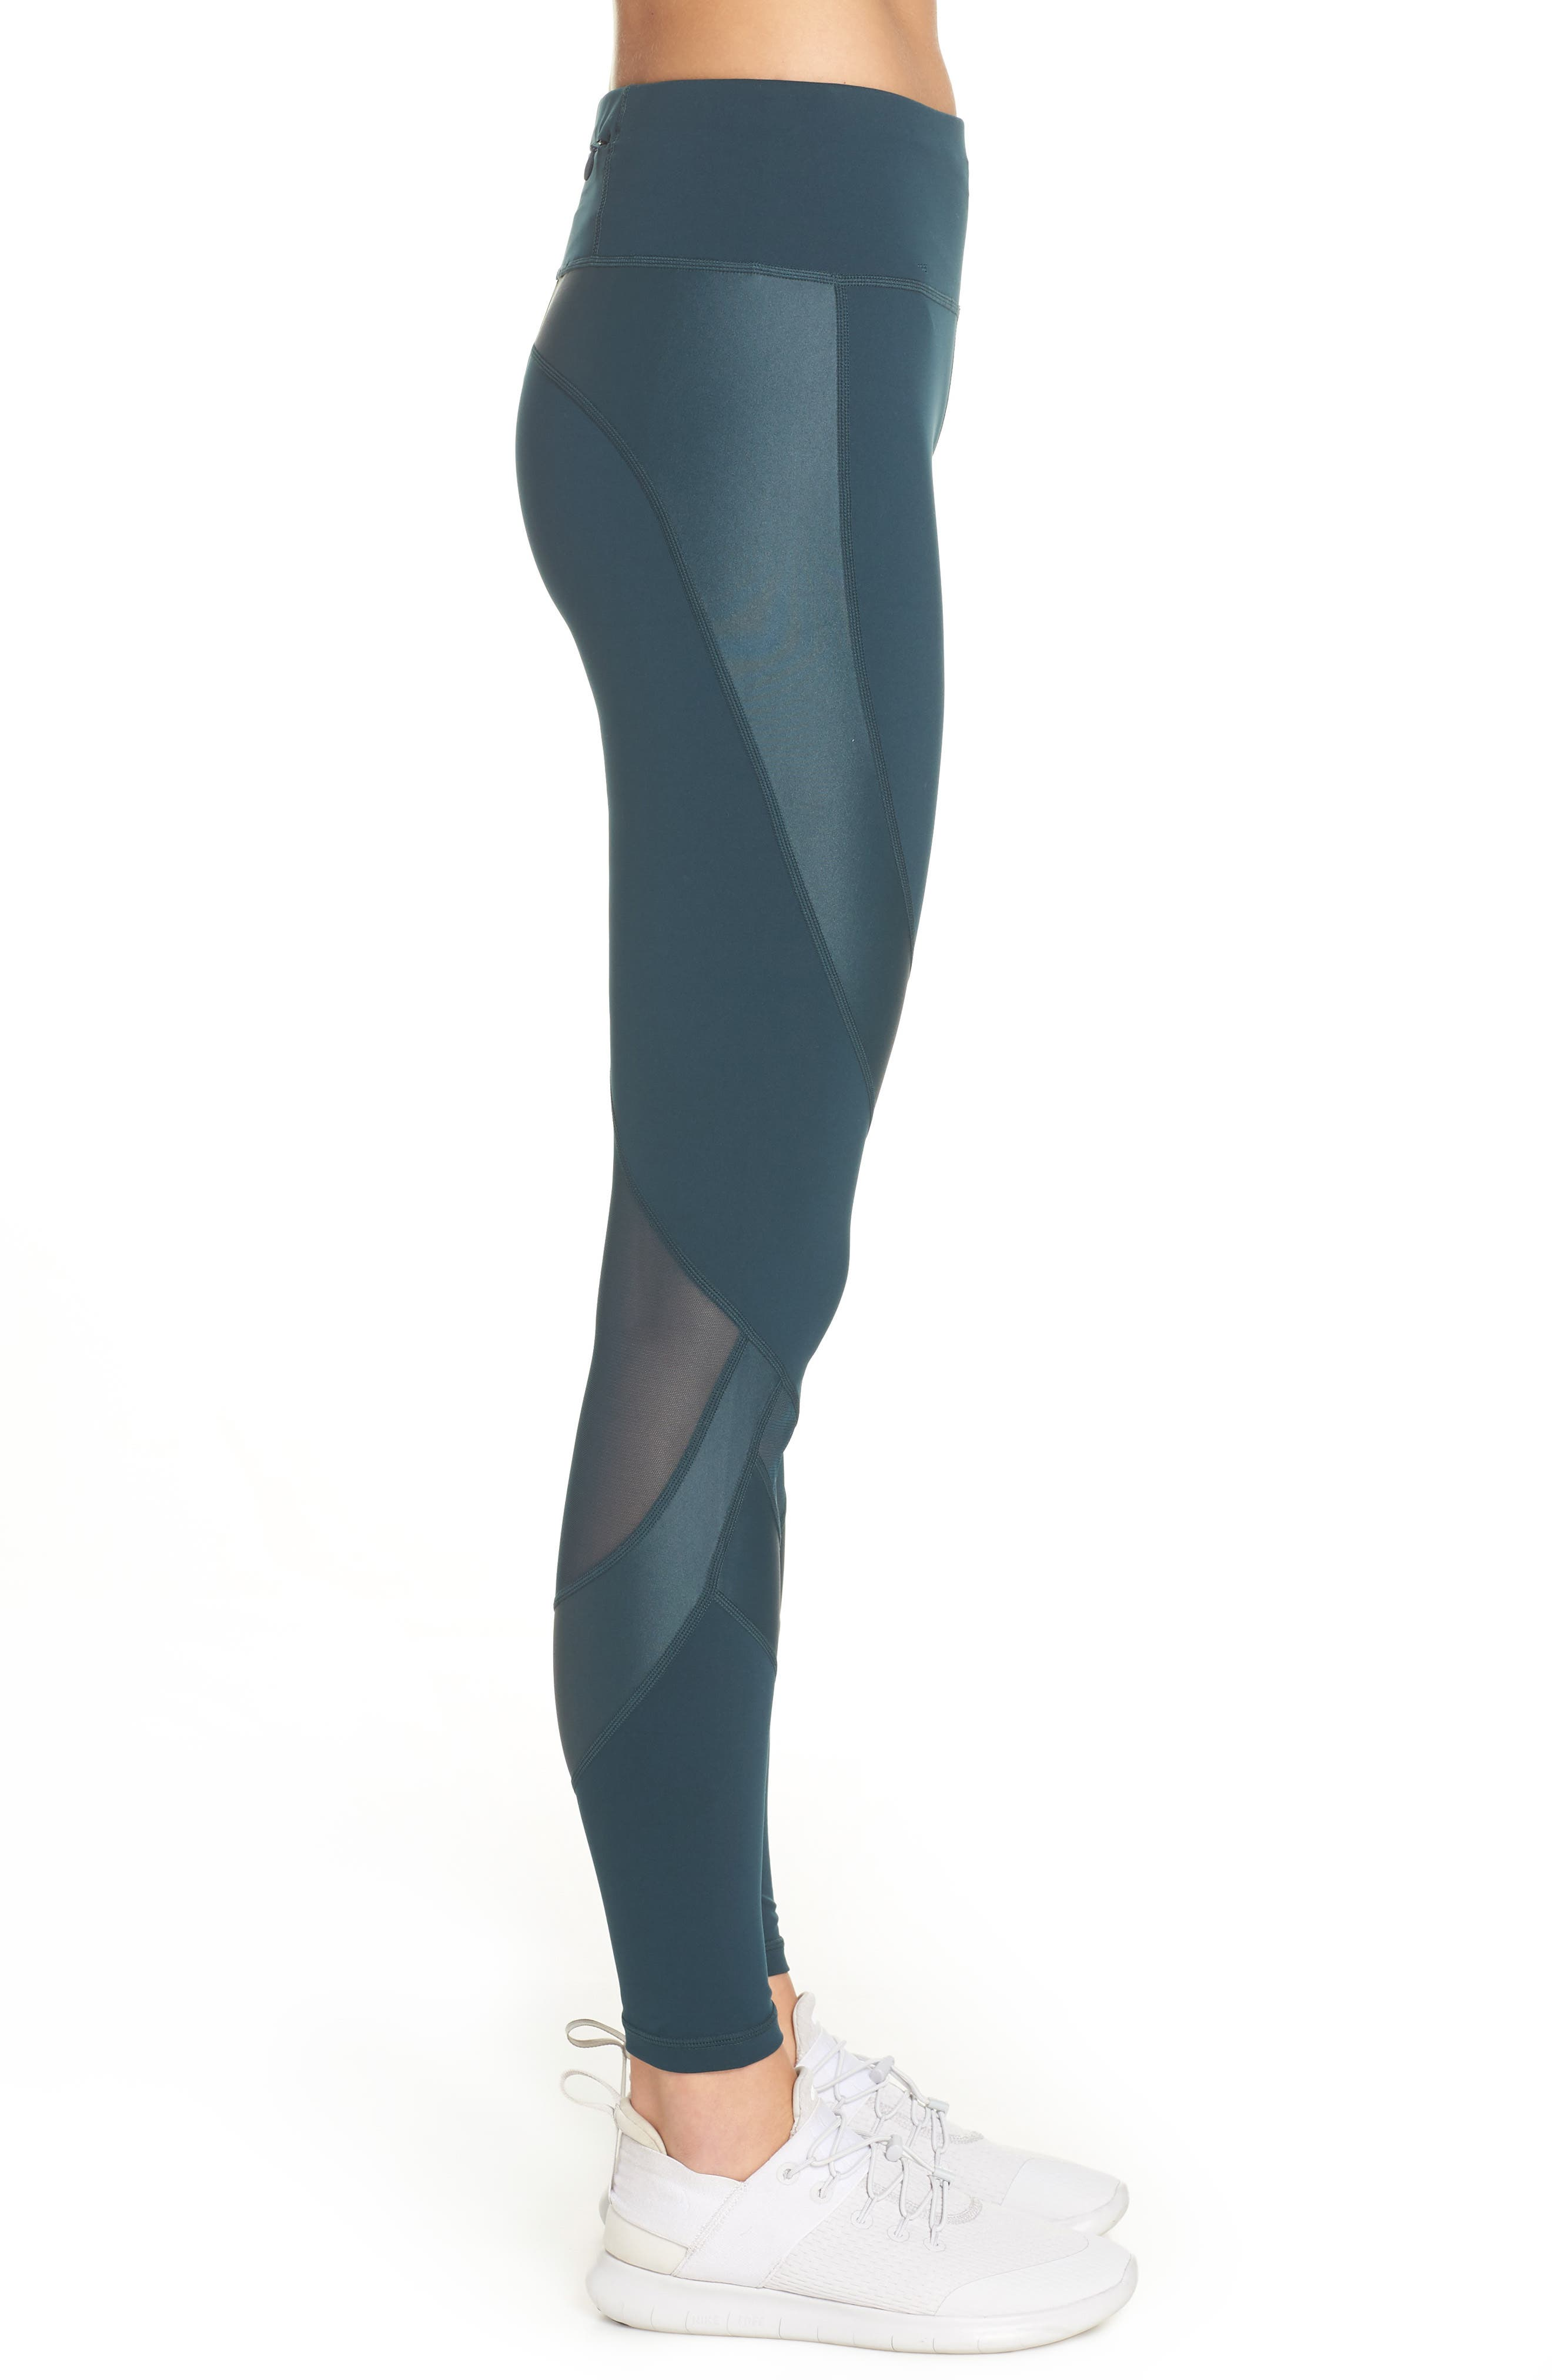 Power Wetlook Mesh Workout Leggings,                             Alternate thumbnail 3, color,                             MIDNIGHT TEAL